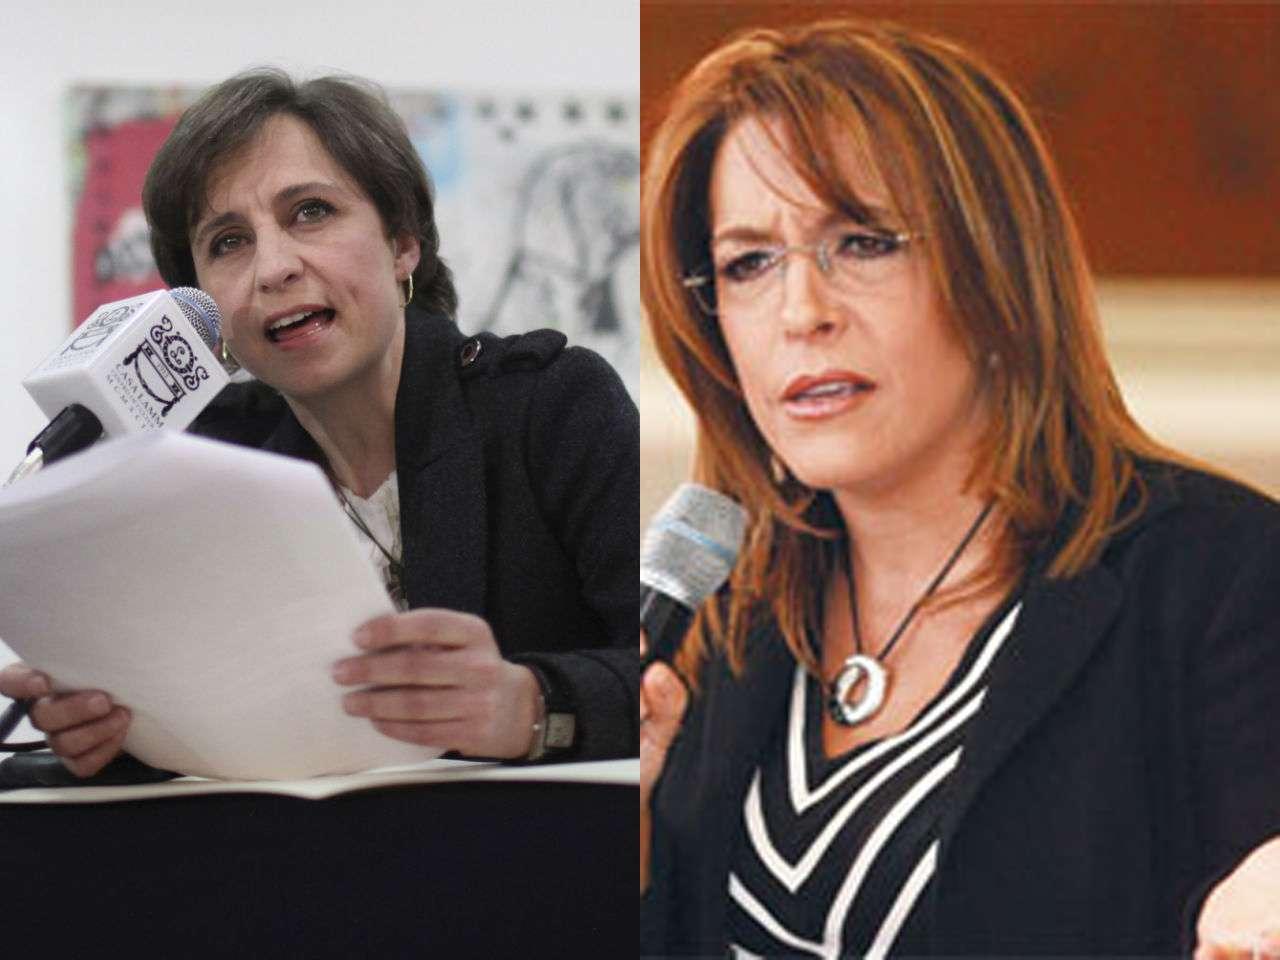 Fernanda Familiar critica la forma de actuar de la periodista Carmen Aristegui. Foto: Agencias